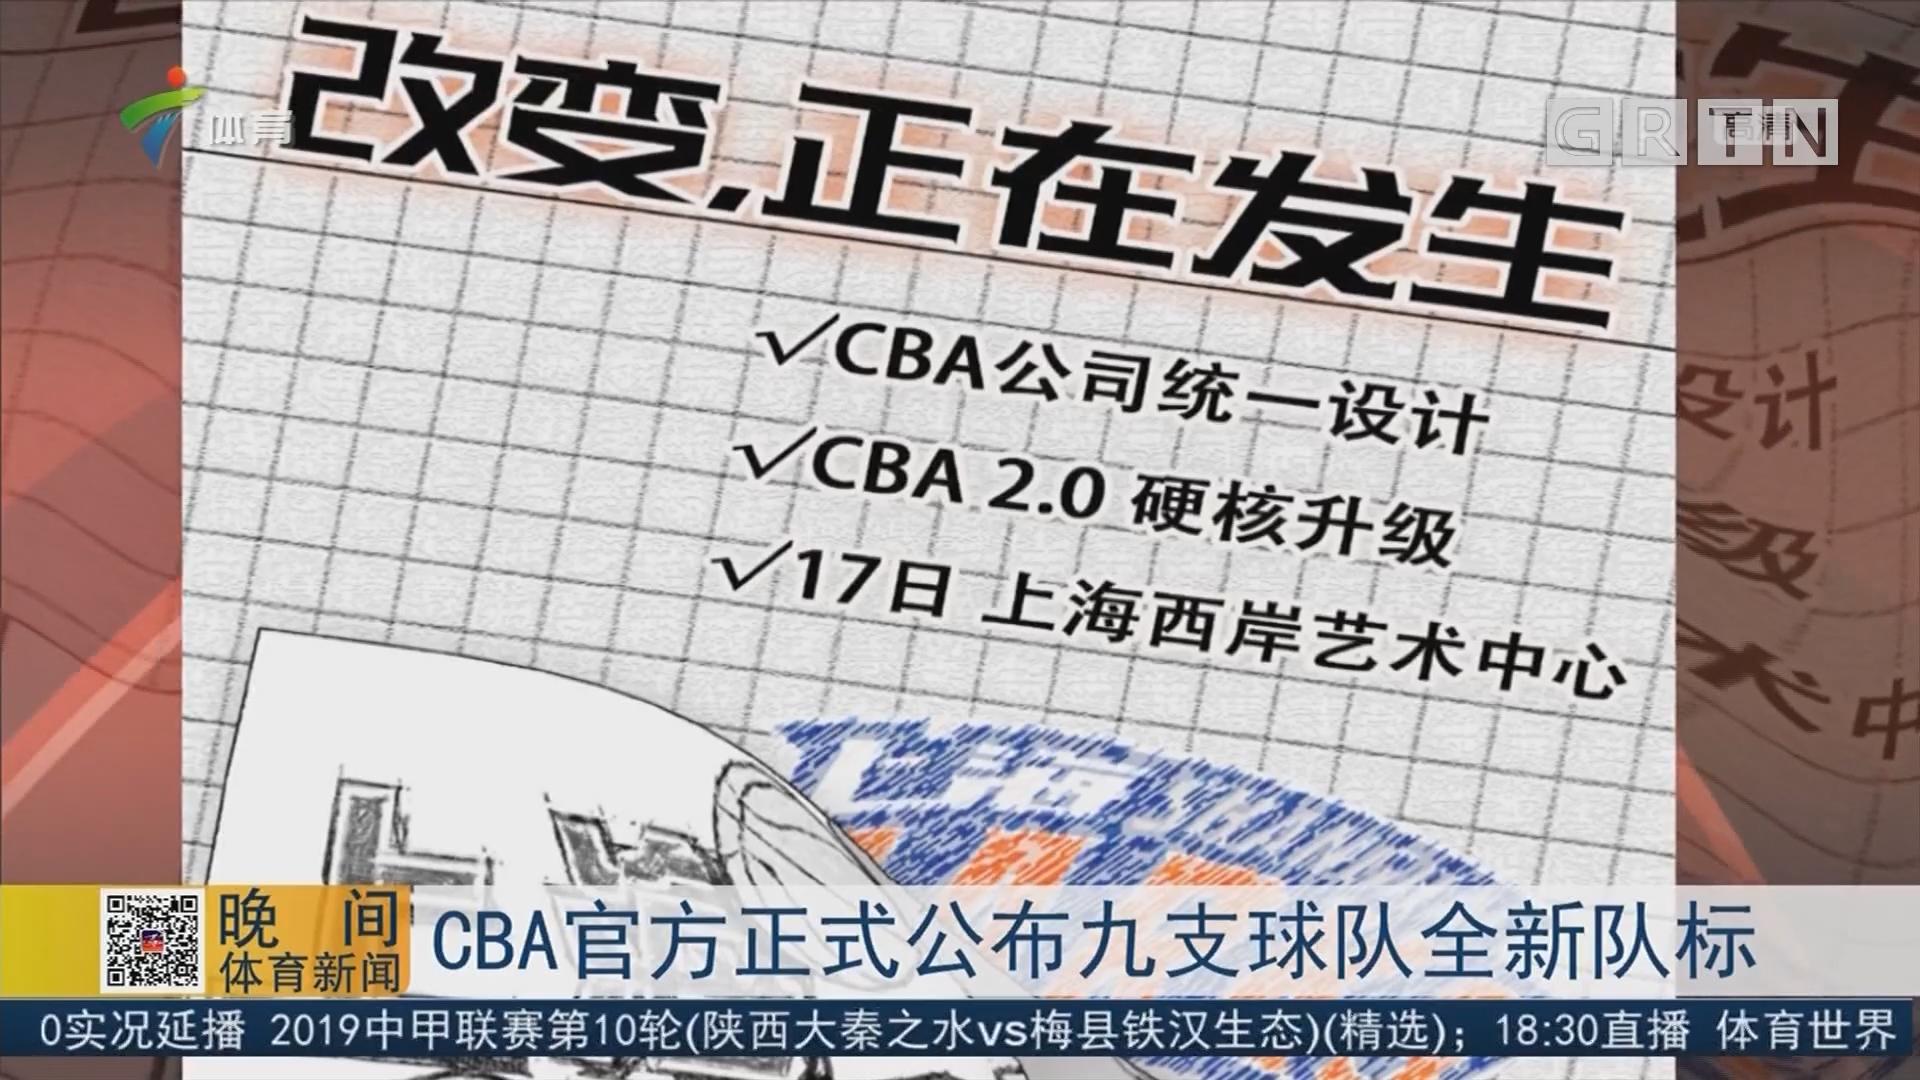 CBA官方正式公布九支球队全新队标